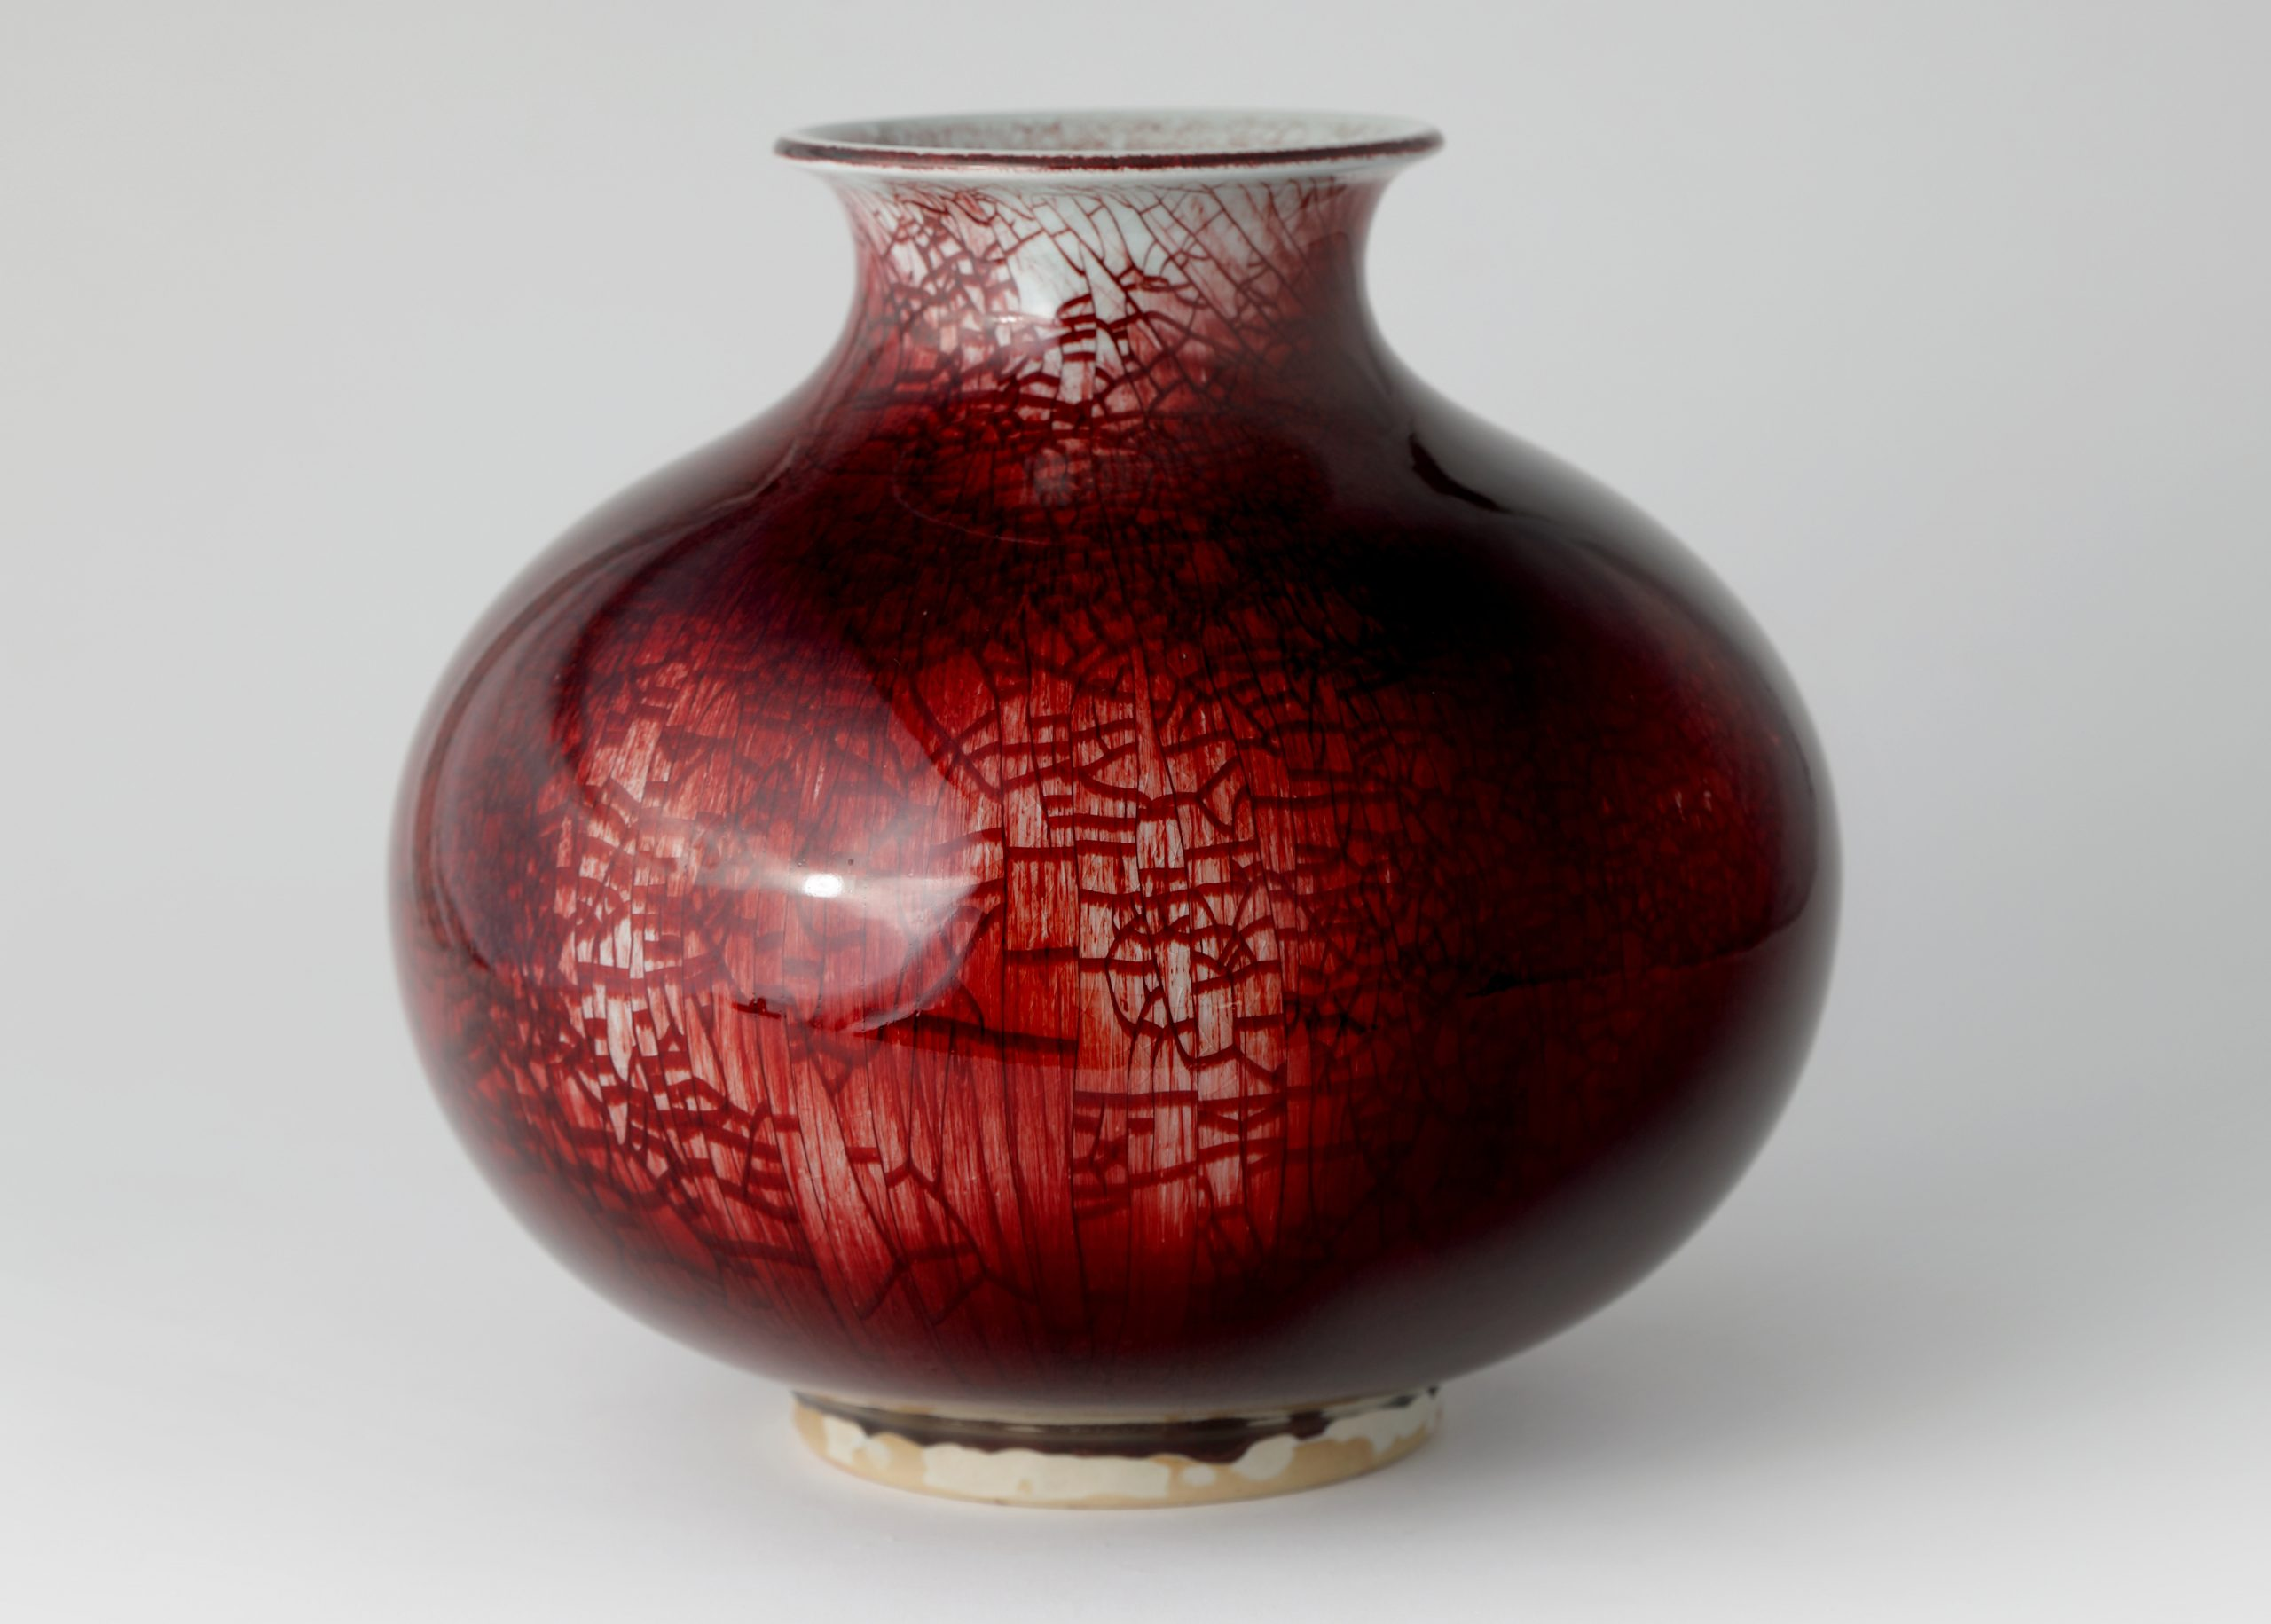 Brilliant Hues: Icheon Ceramics at Han Collection